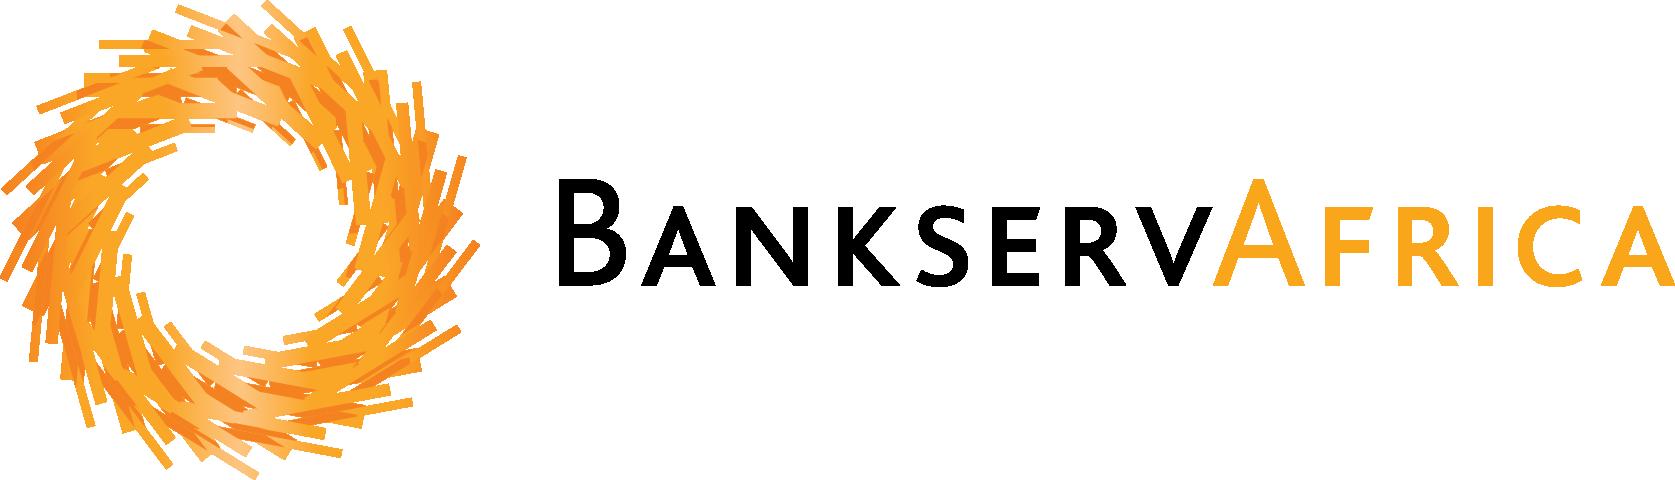 BankservAfrica Logo (002)